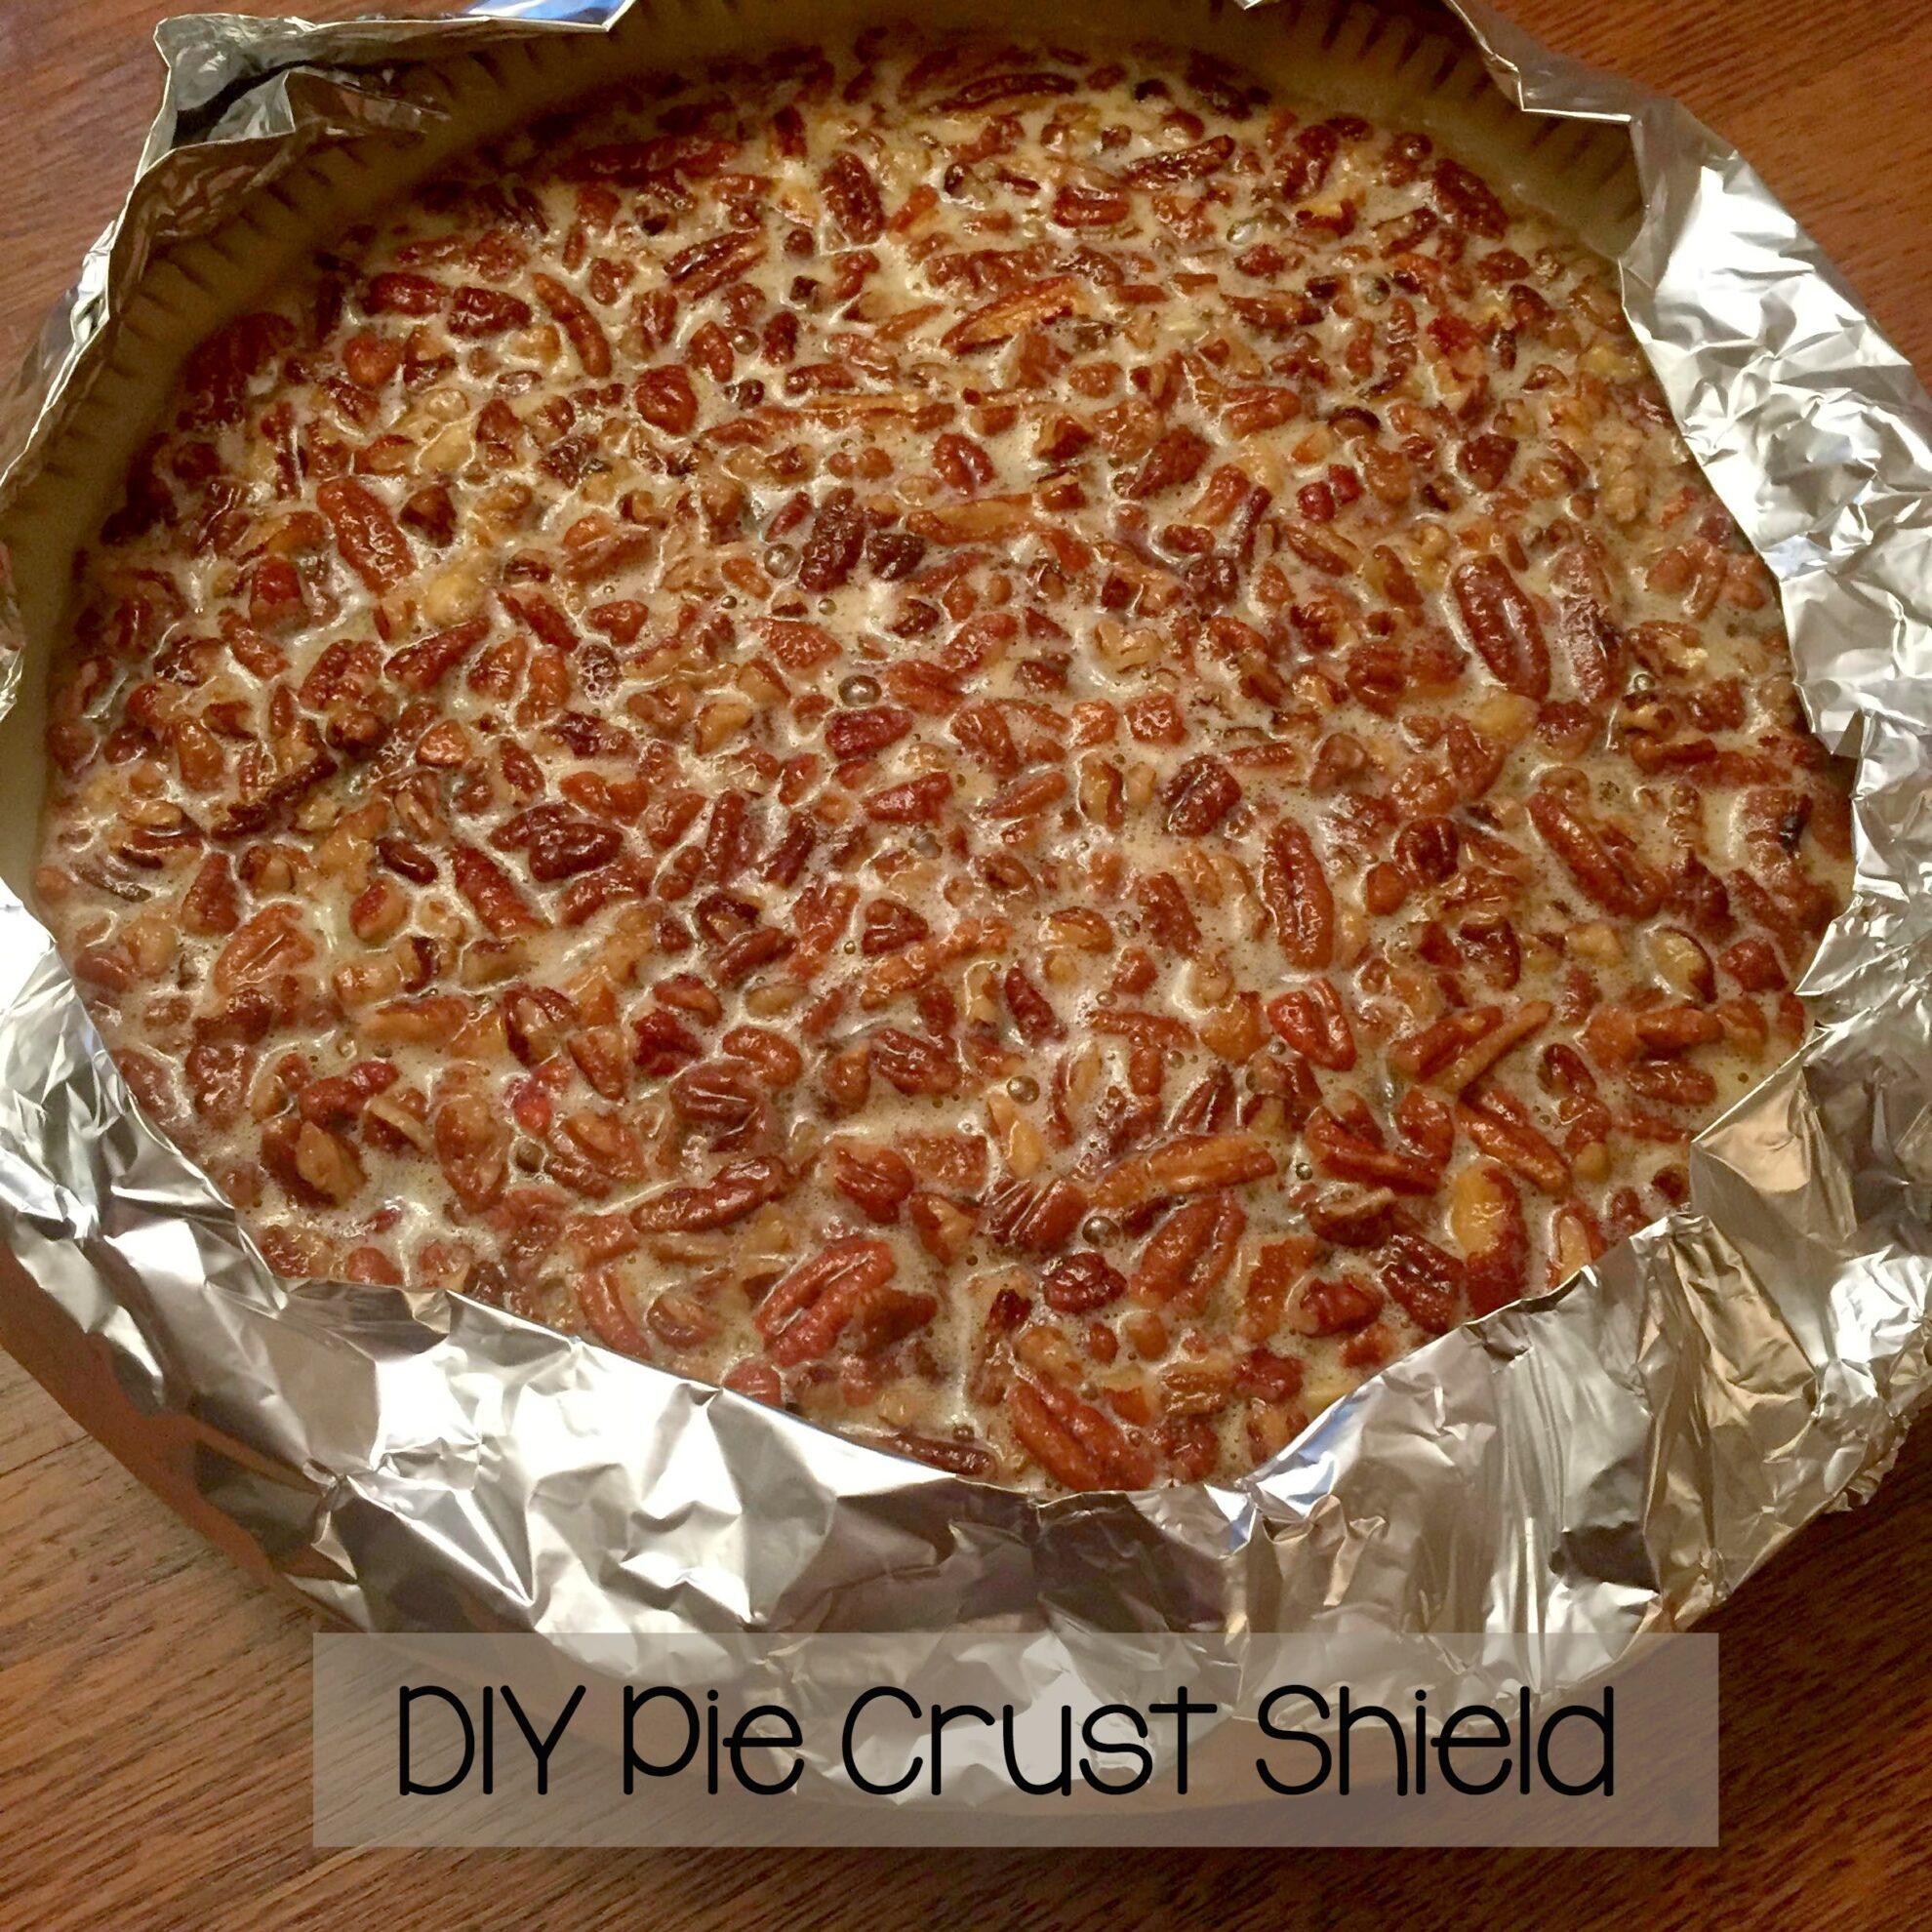 diy-pie-crust-shield